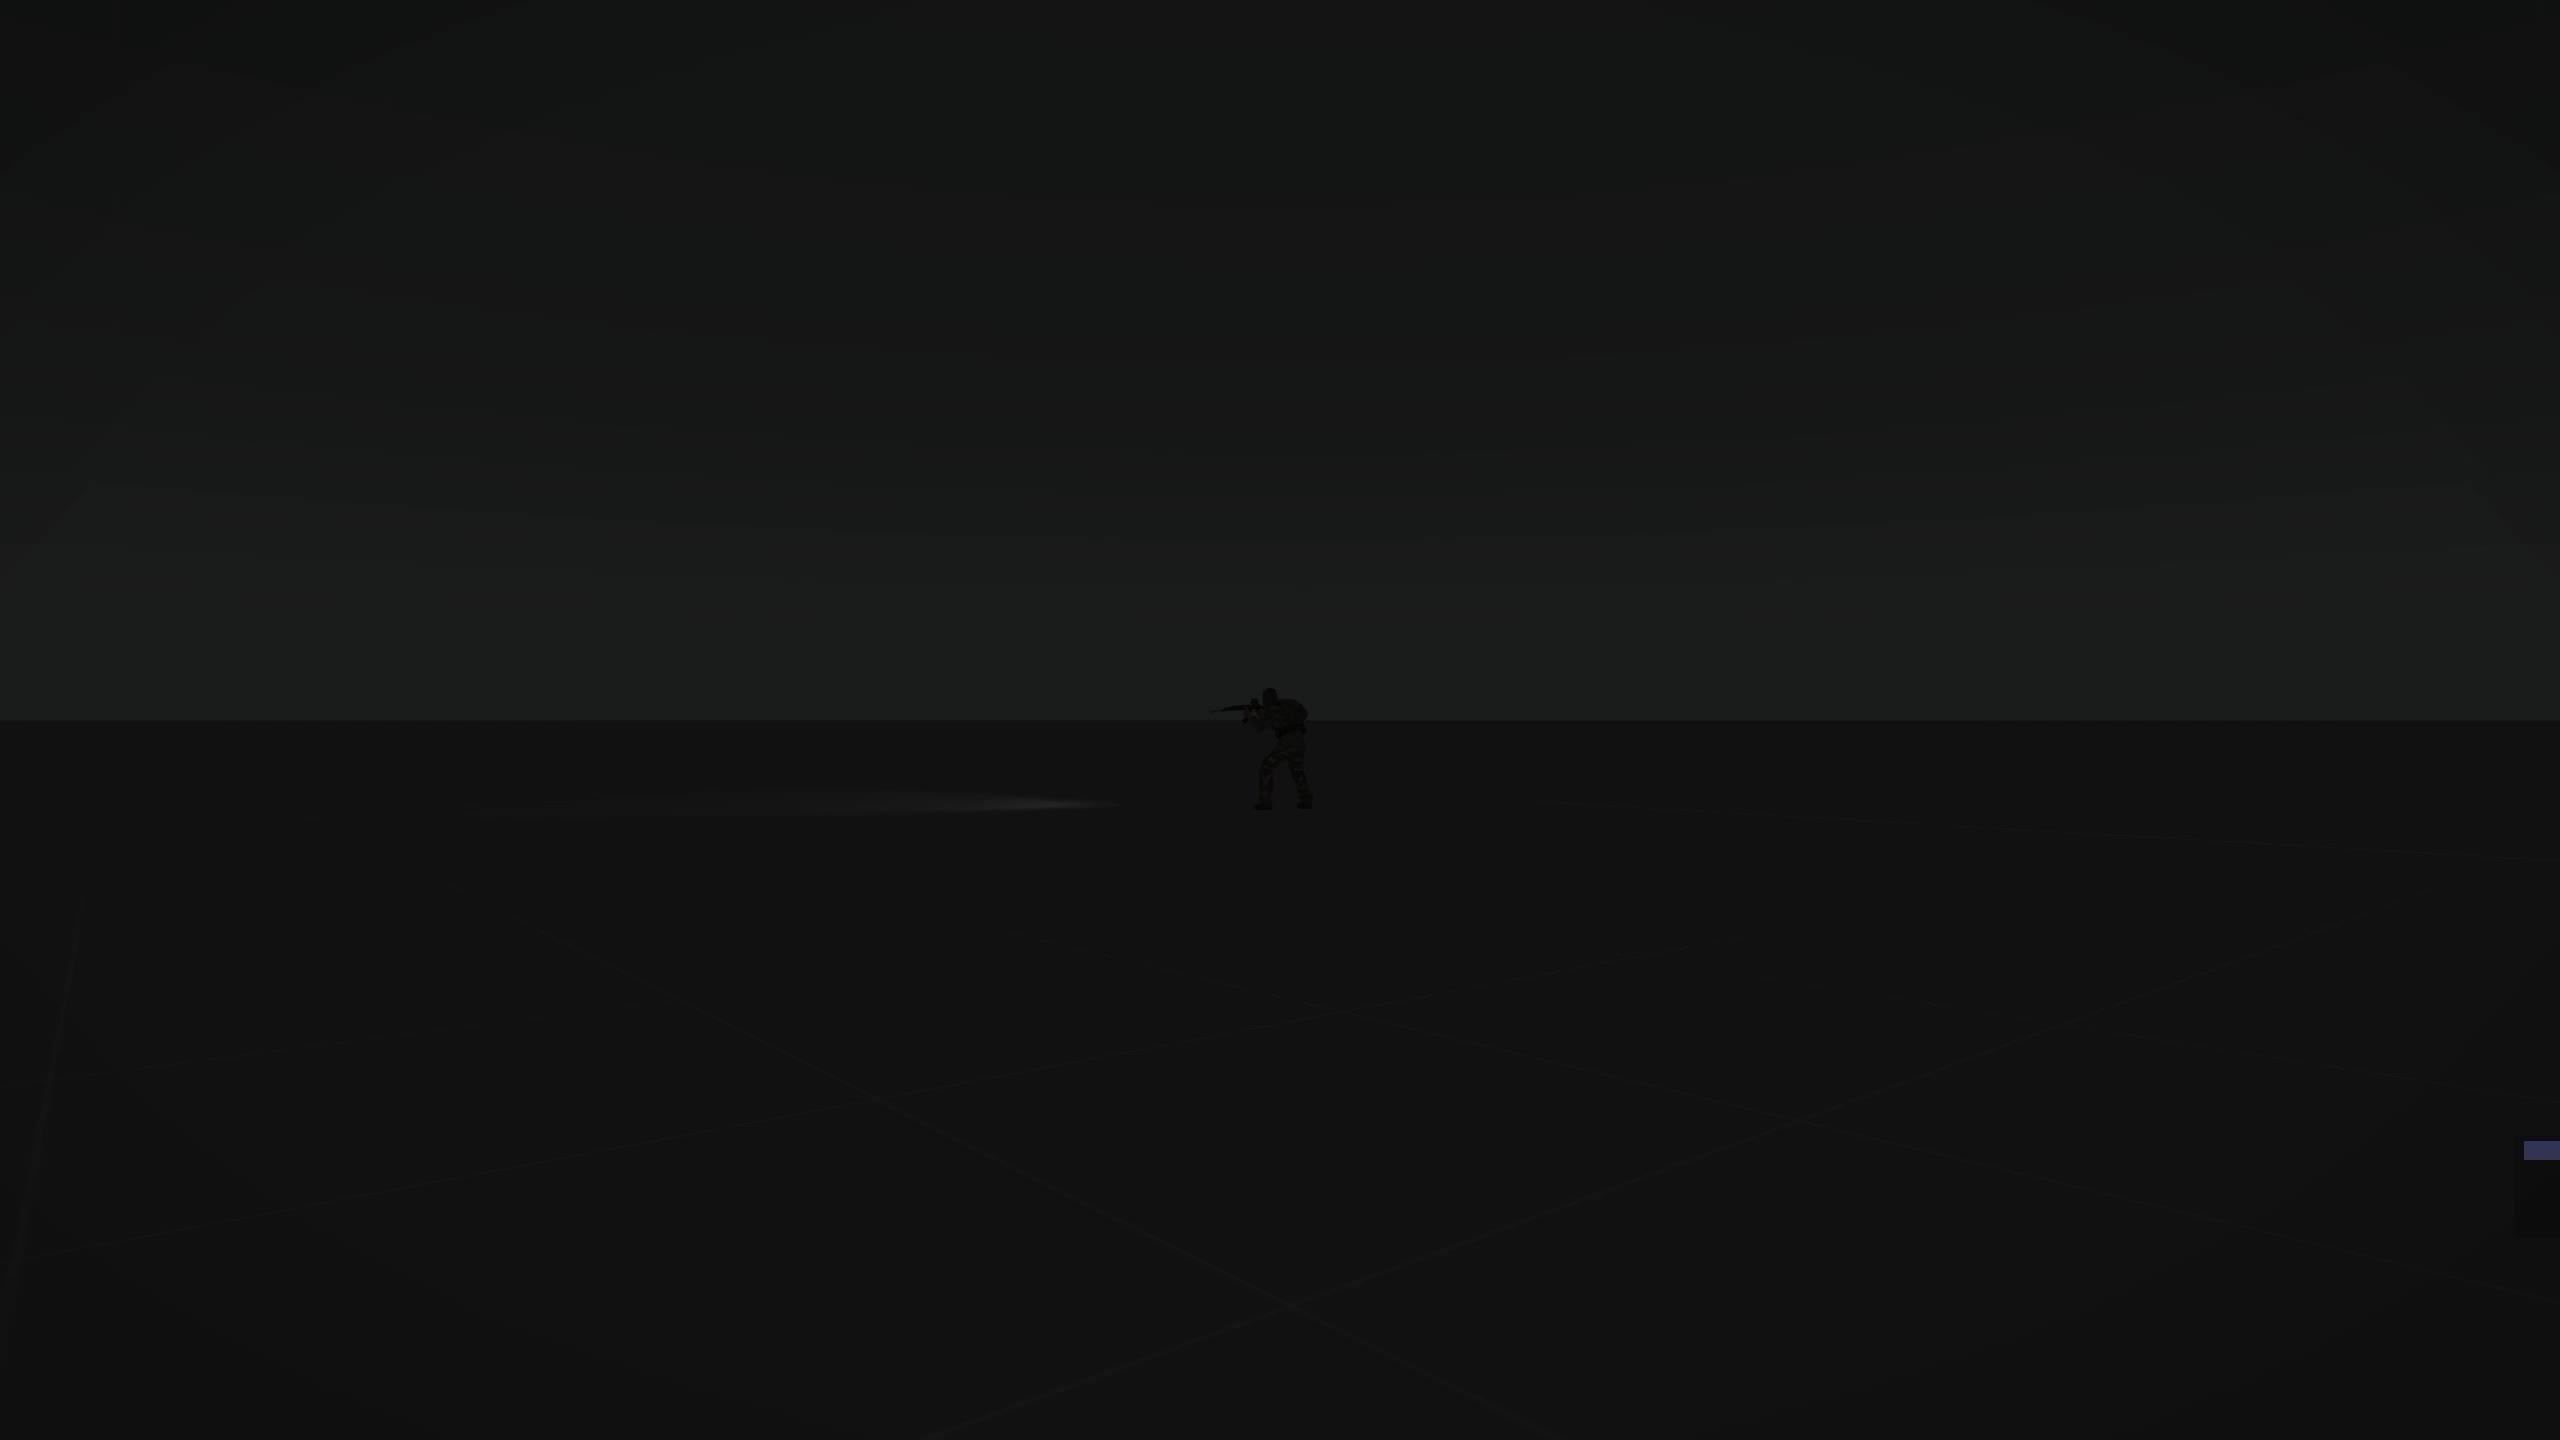 2DP Zenit Flashlight LOD GIFs